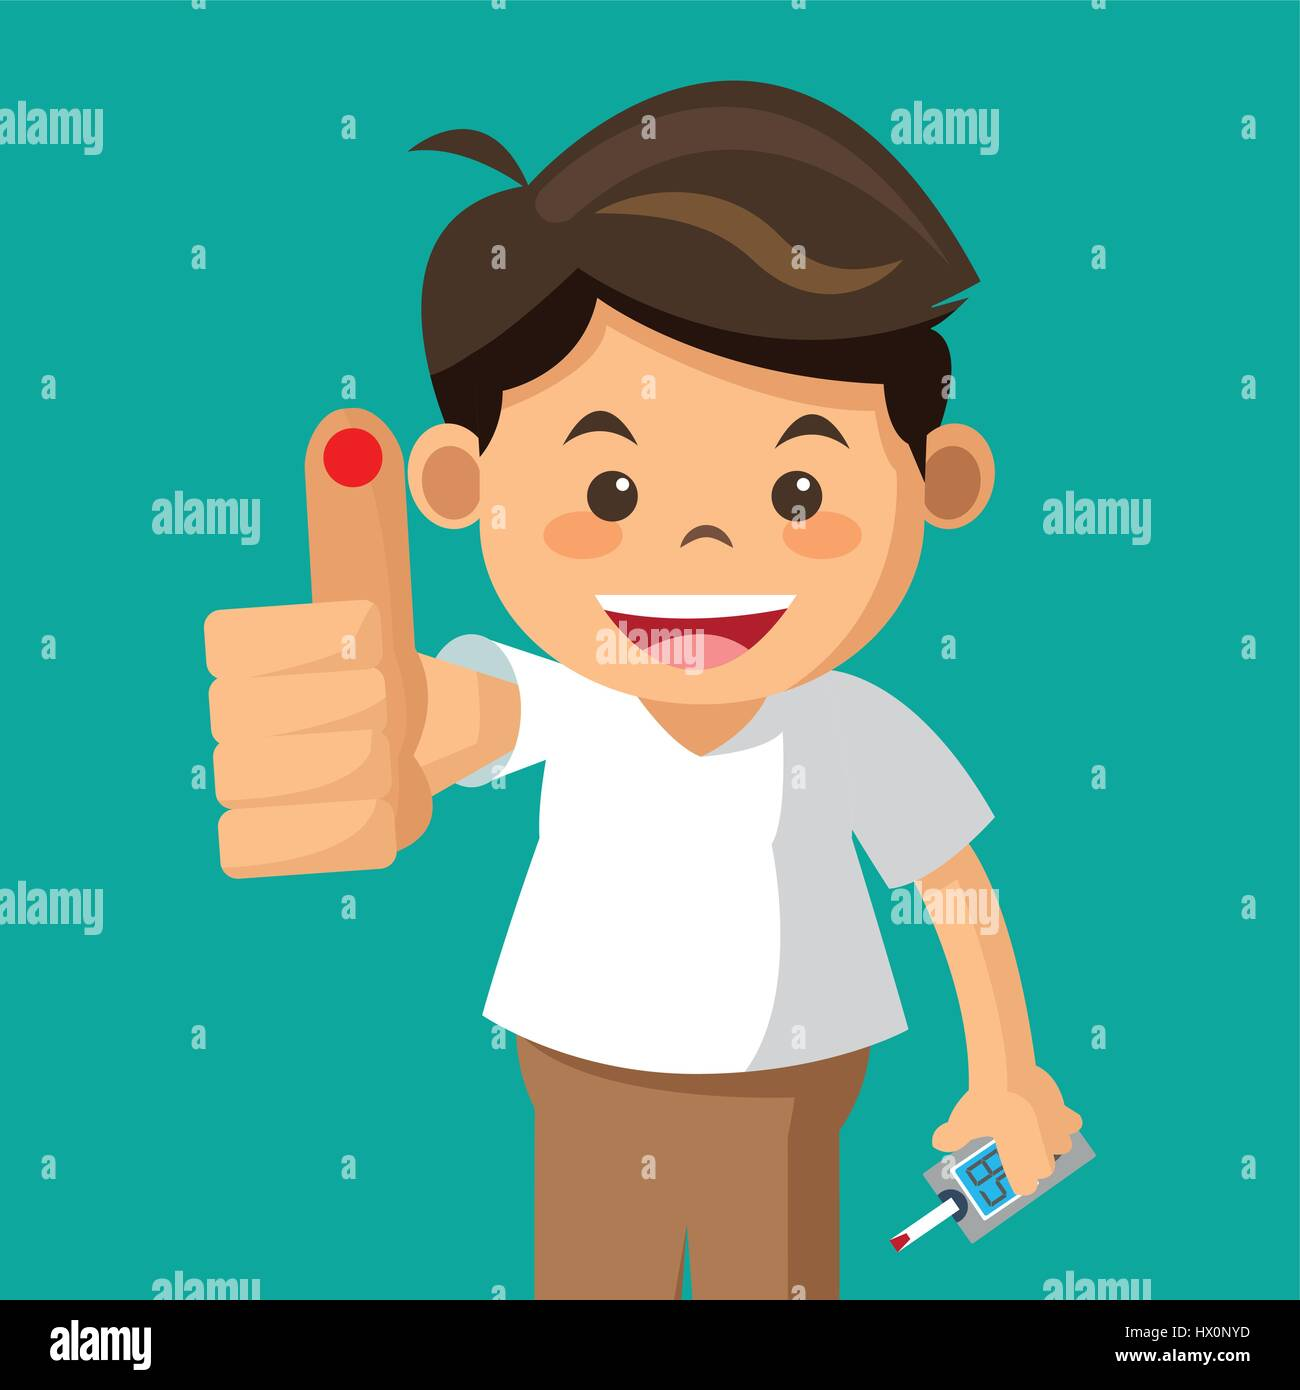 boy diabetes drop test - Stock Image